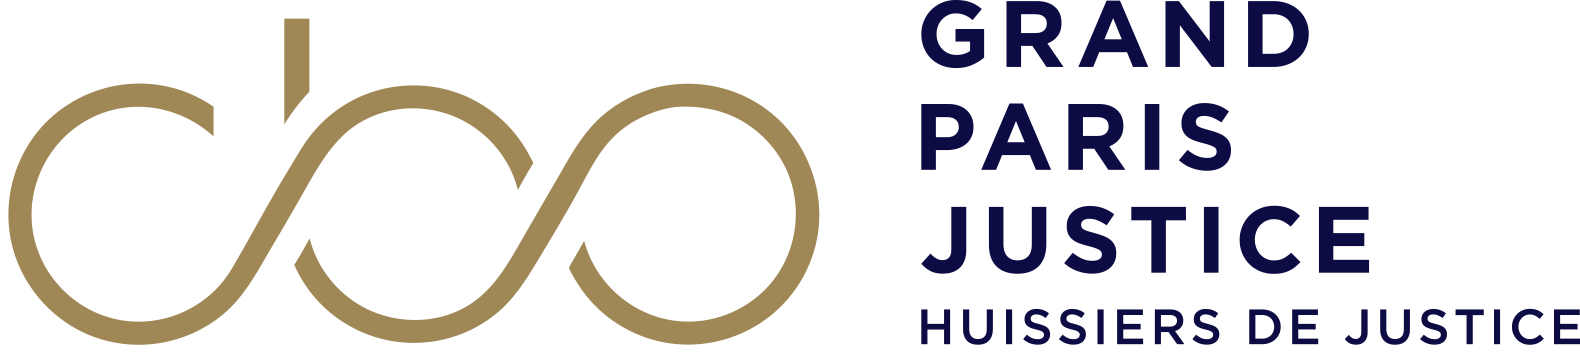 CBO - Grand Paris Justice